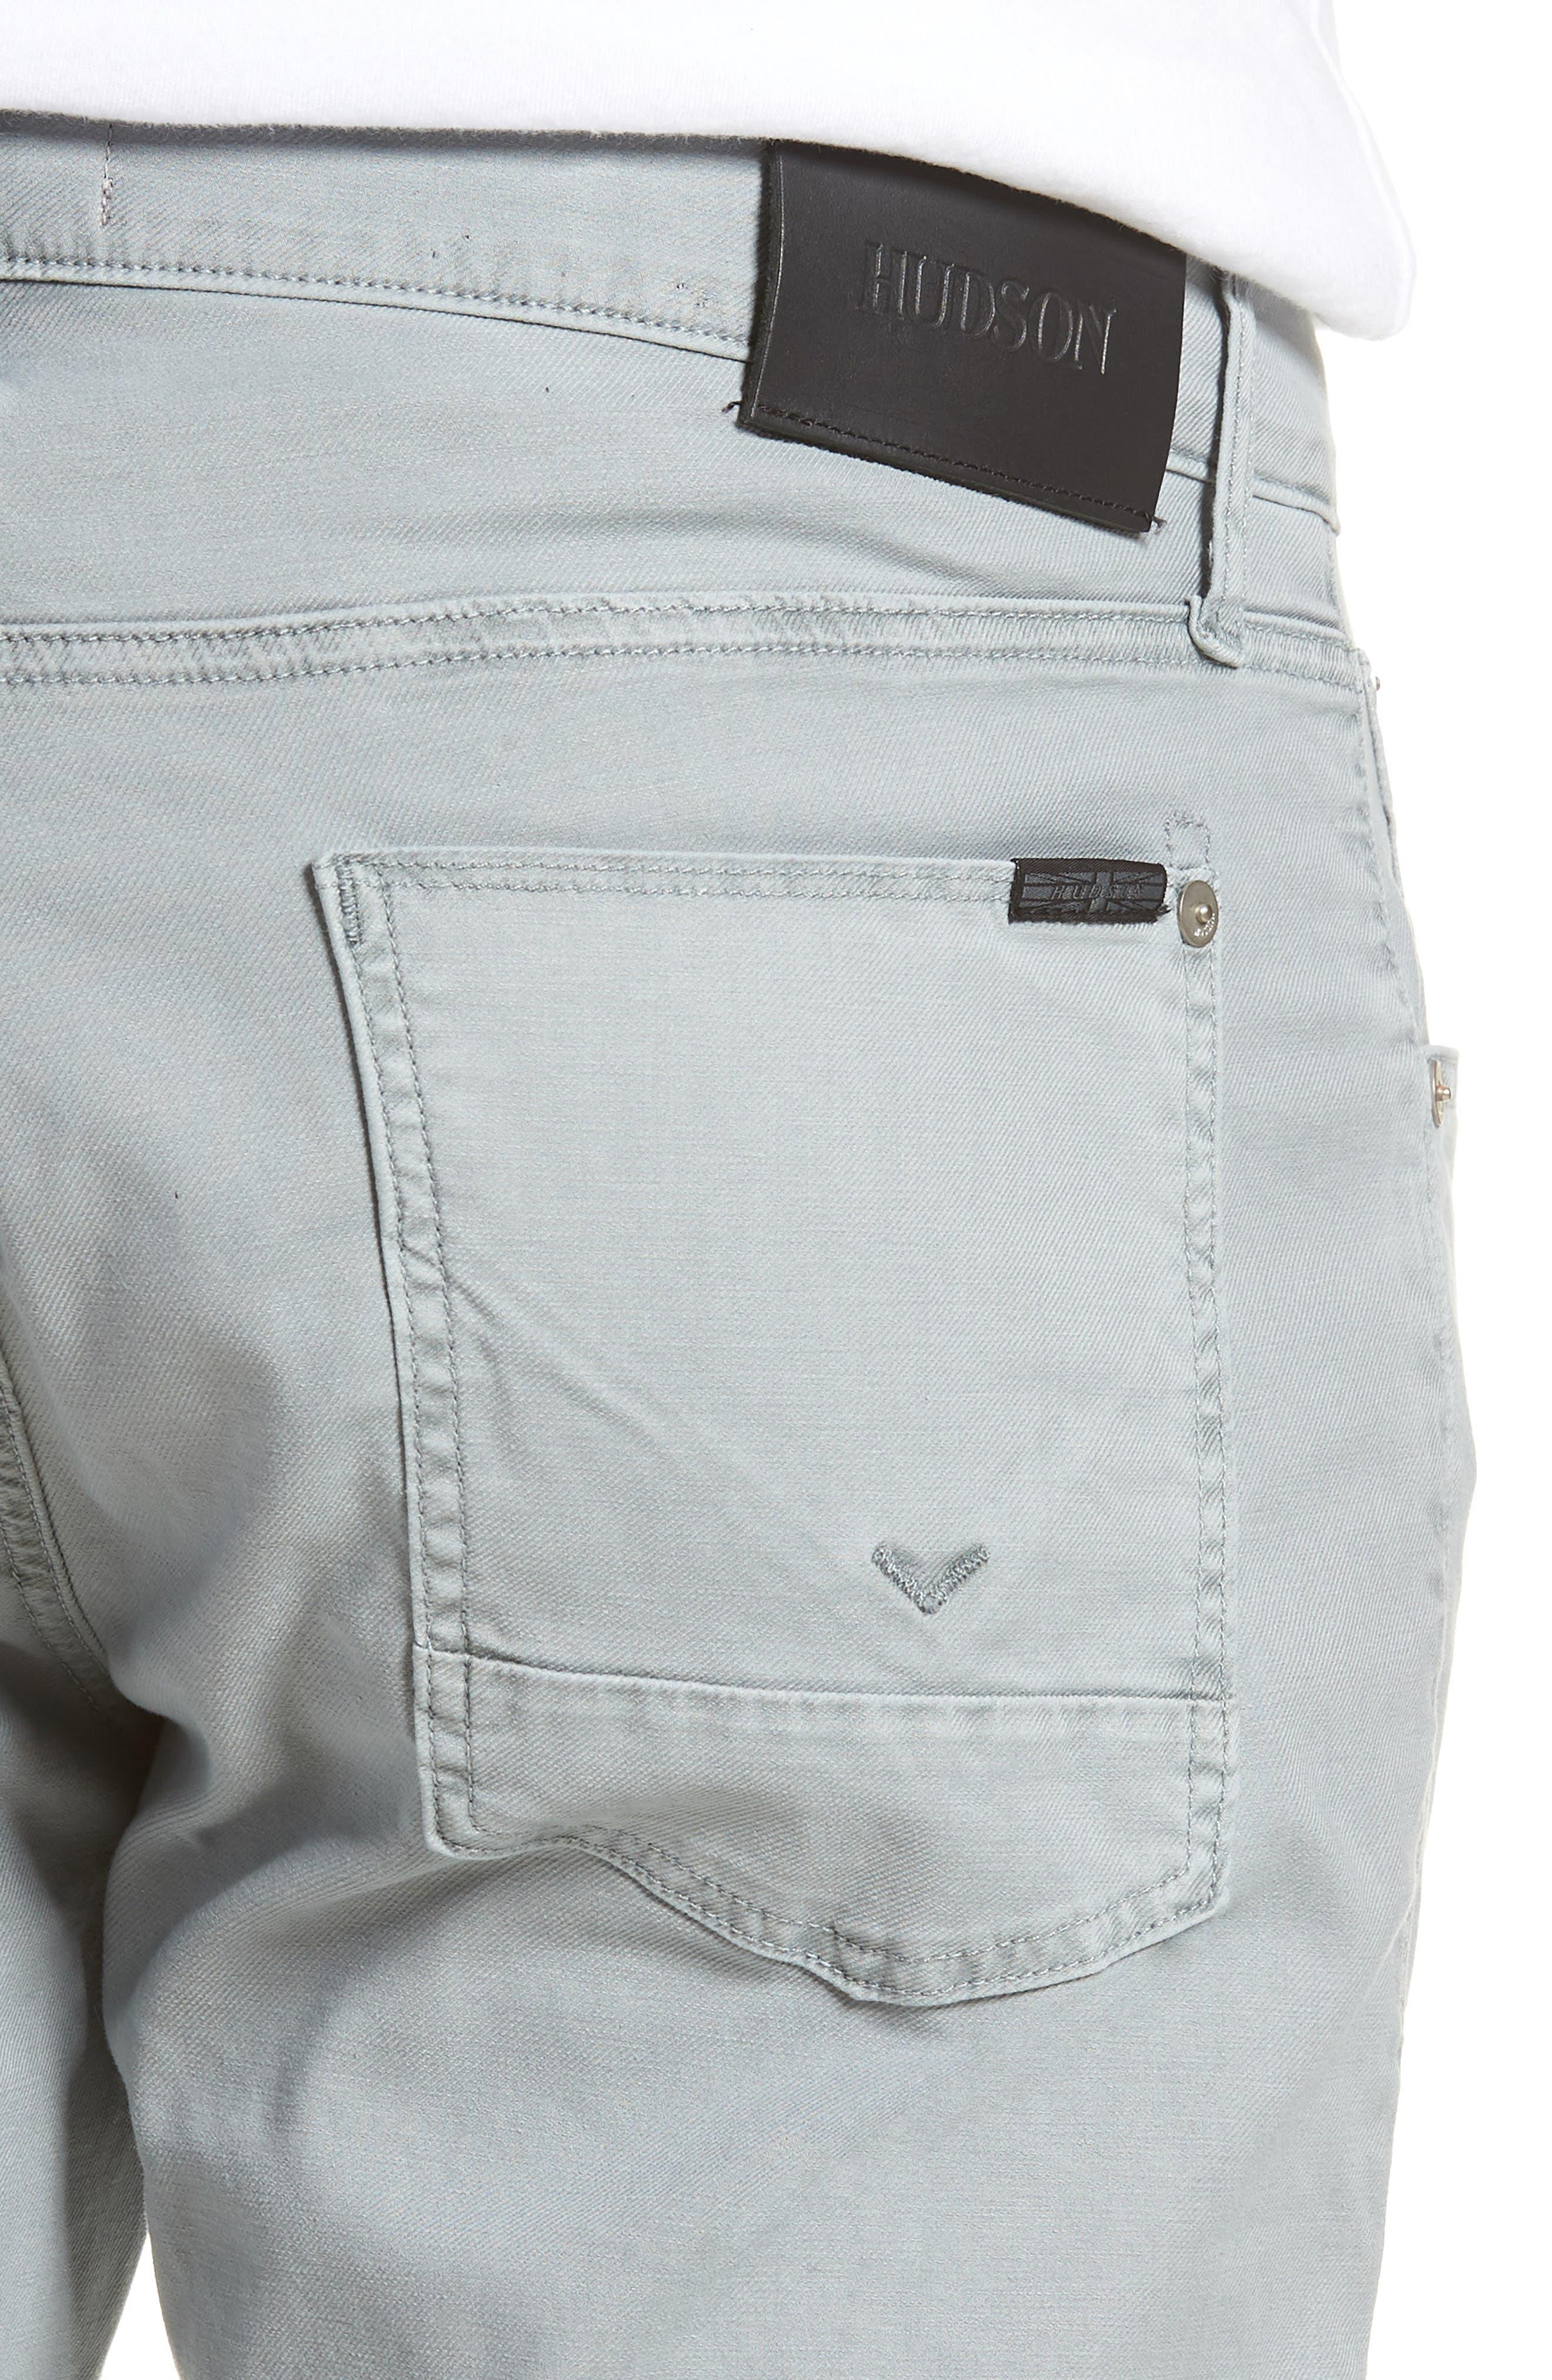 HUDSON JEANS,                             Blake Slim Fit Jeans,                             Alternate thumbnail 4, color,                             400